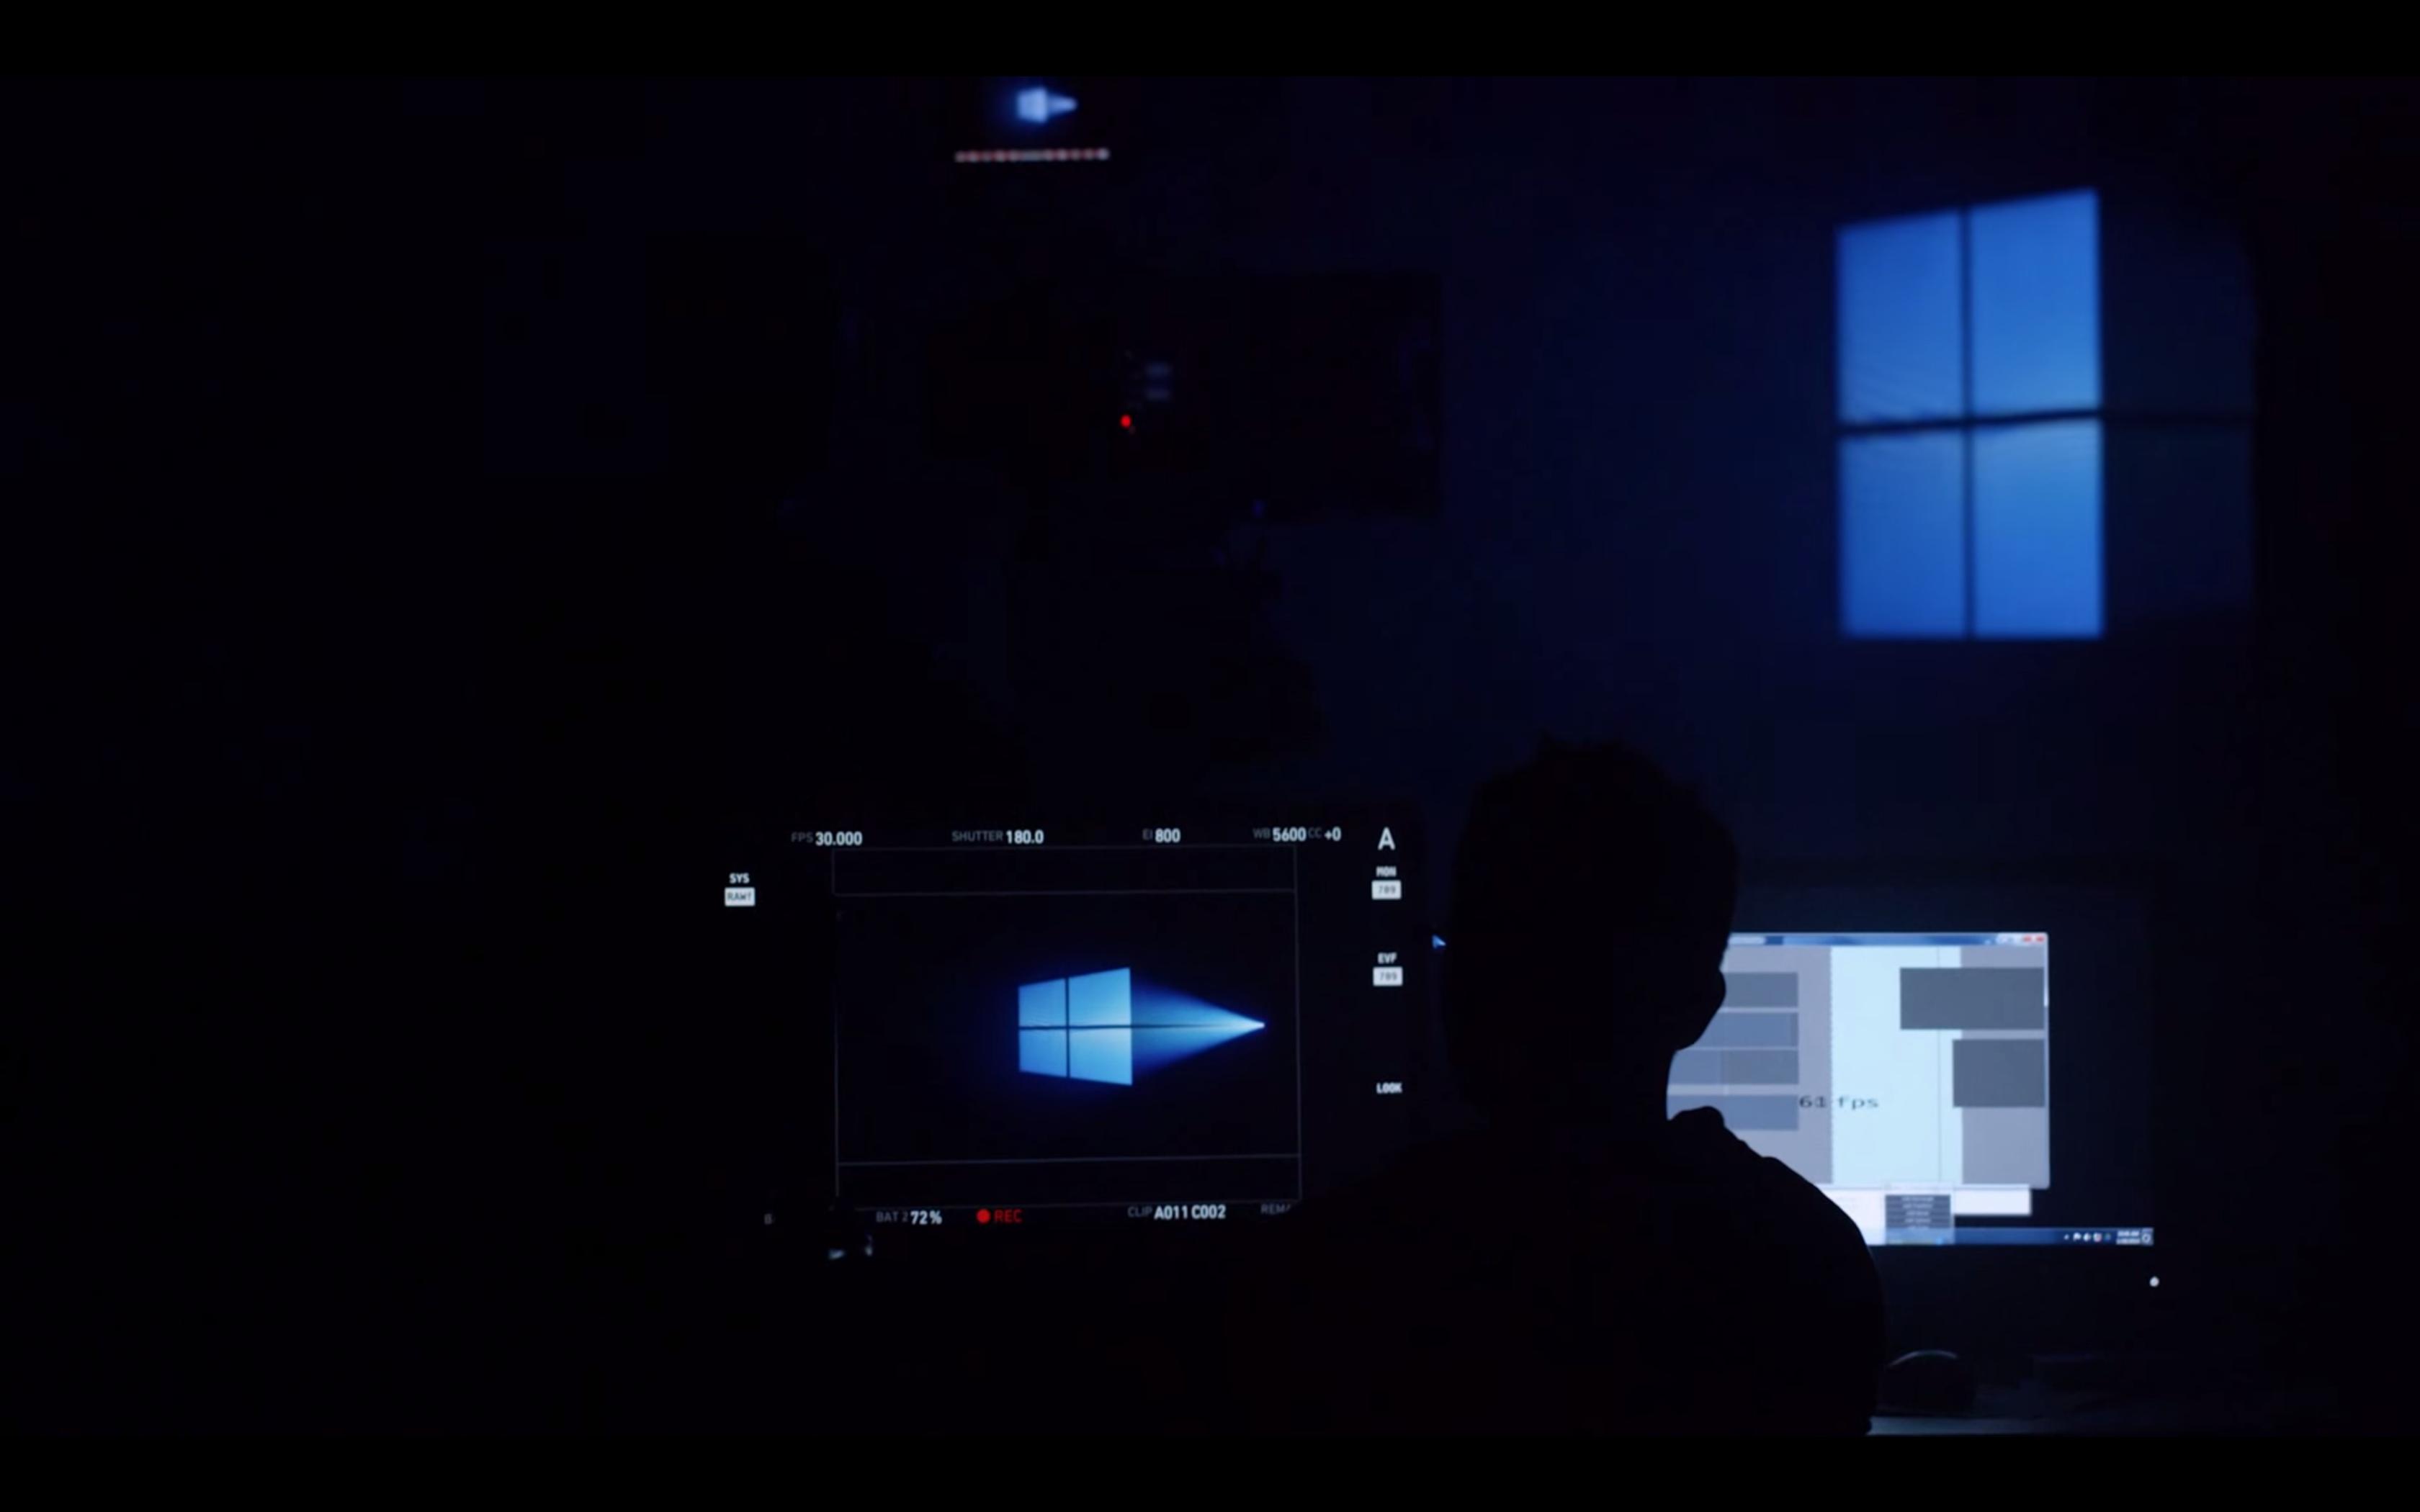 Windows 10 Tron Wallpaper